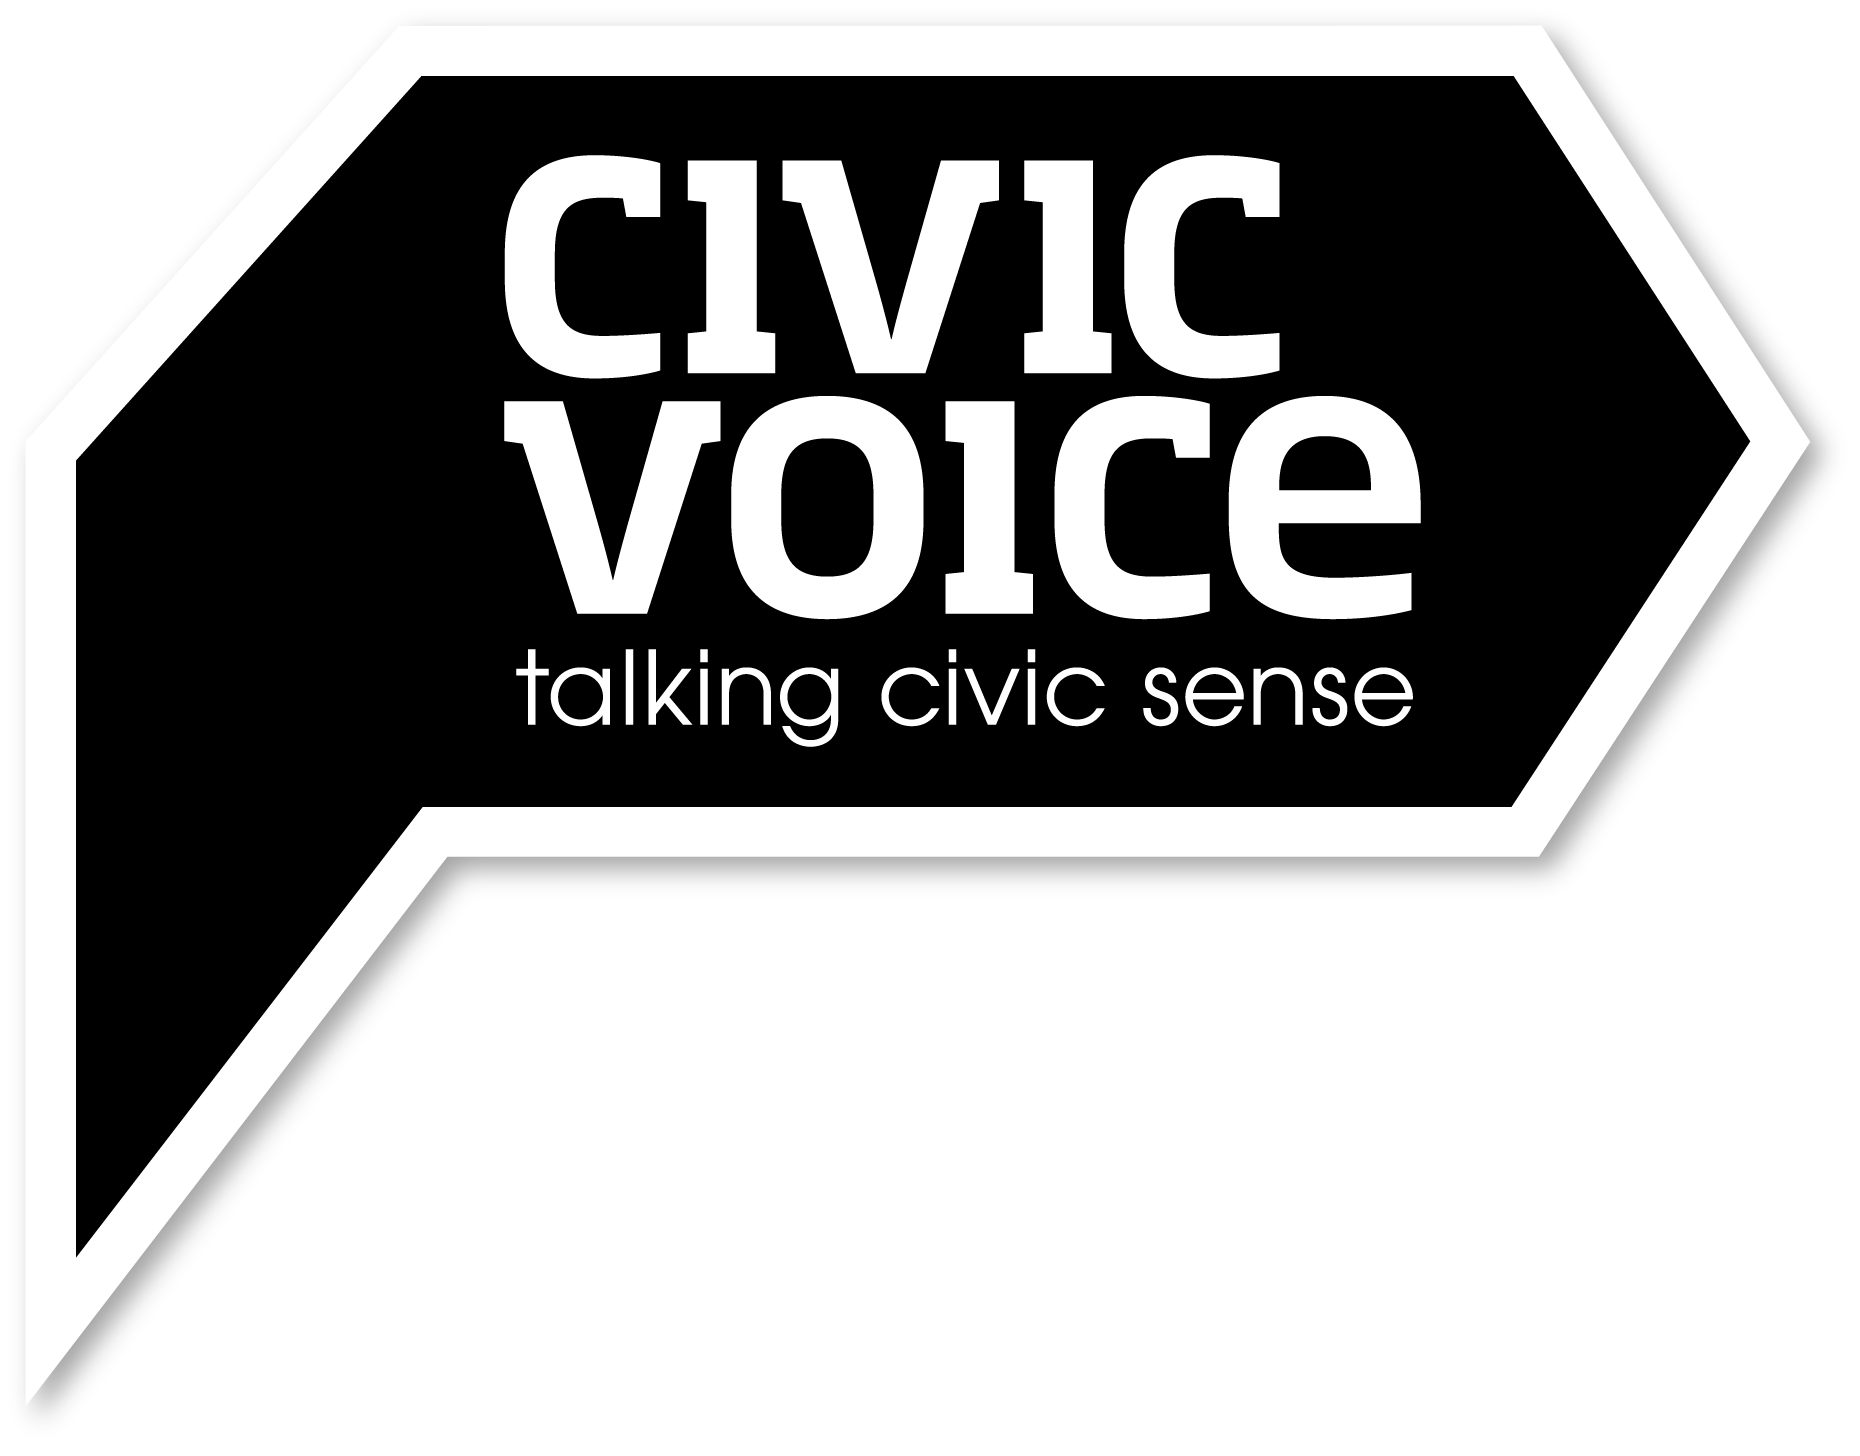 CV_logo_Blck_RGB.png